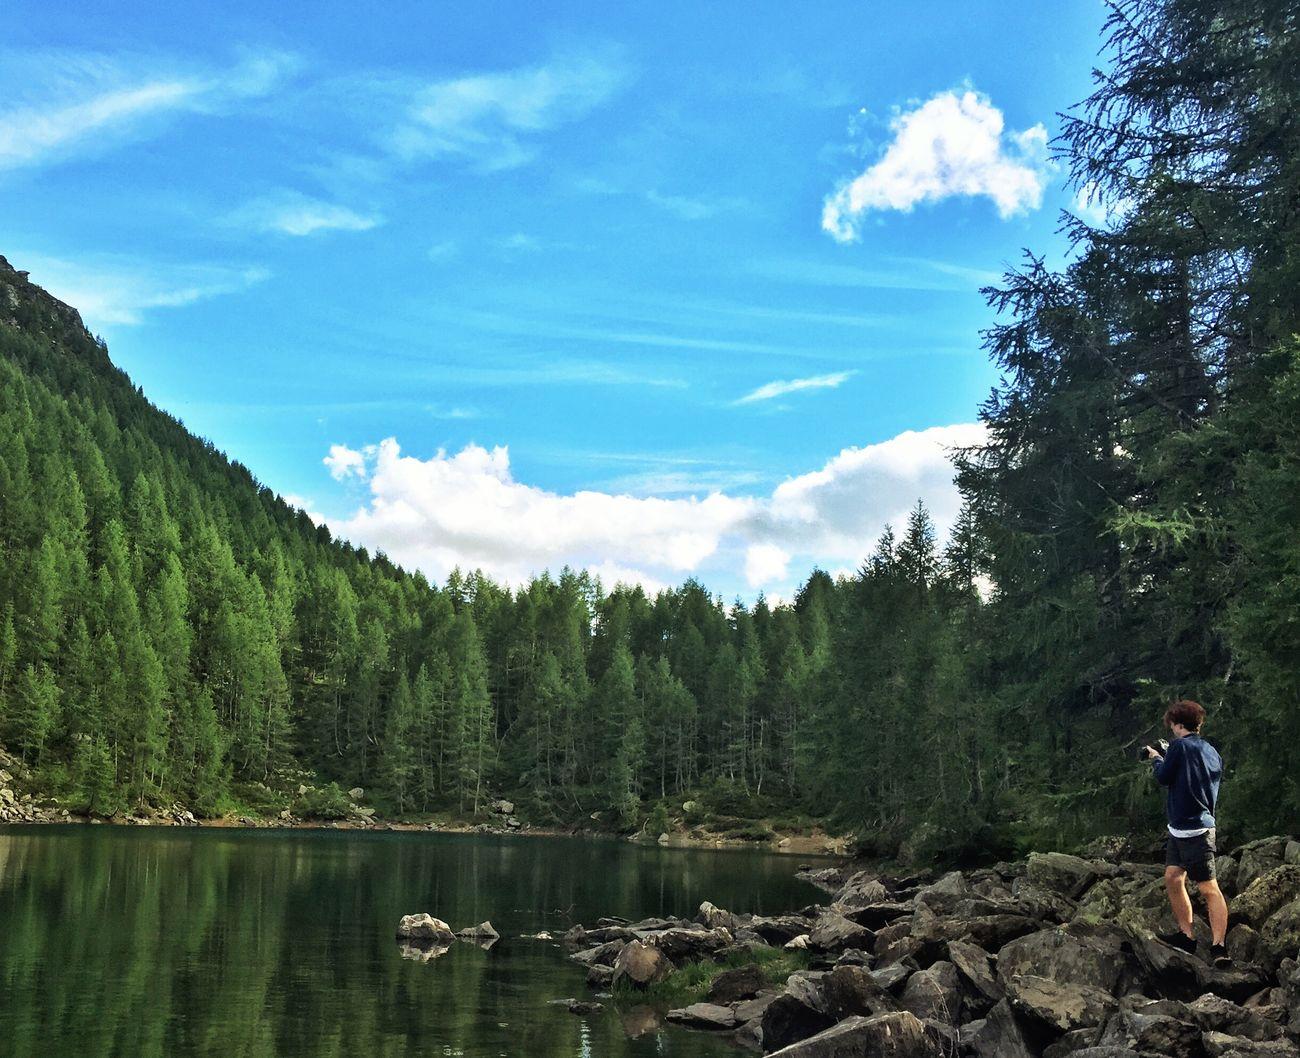 Lago azzurro, Madesimo(SO), Italy EyeEm Best Shots Landscape First Eyeem Photo